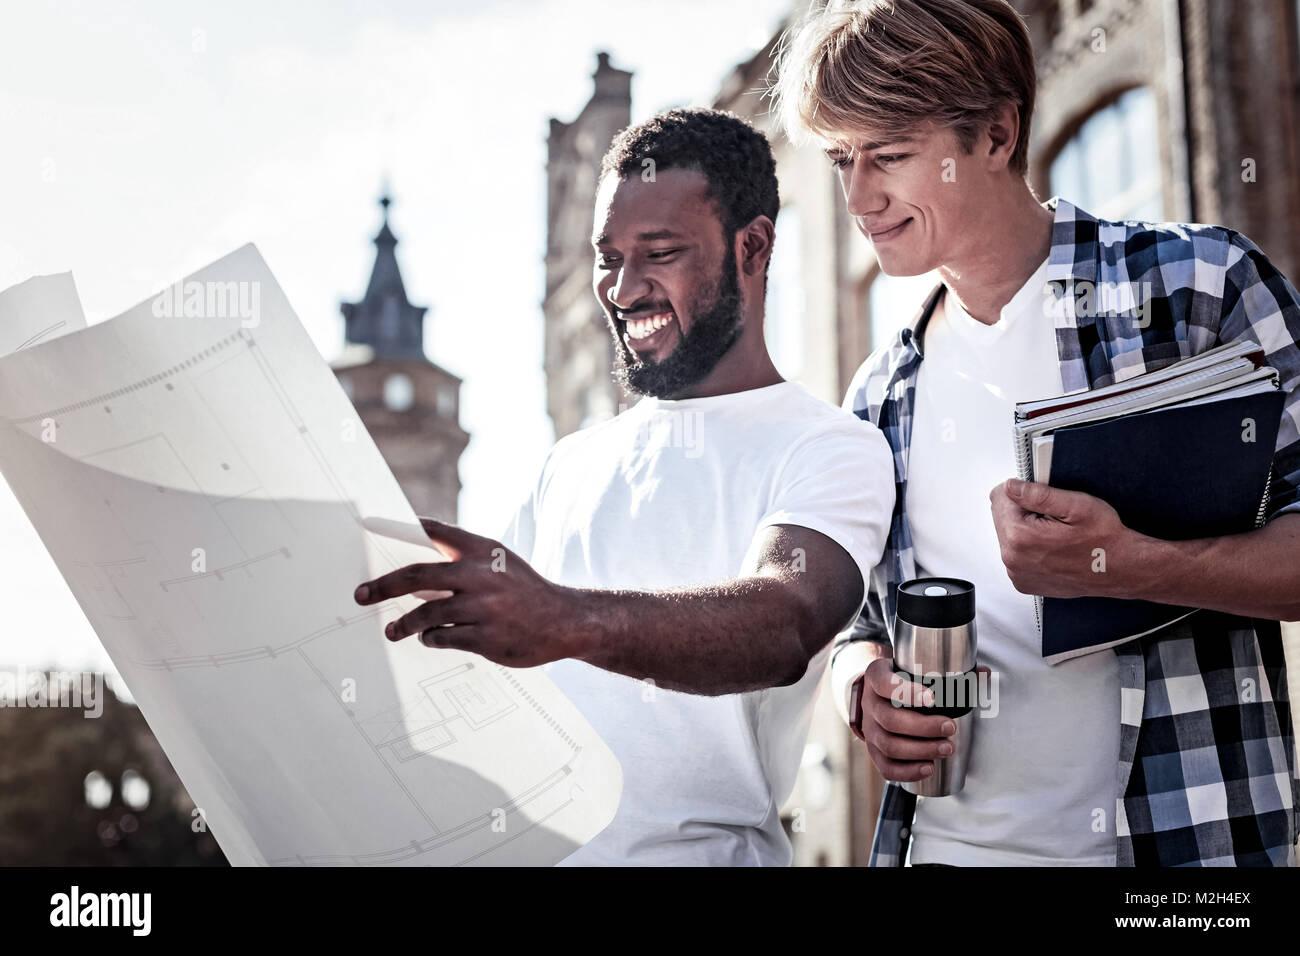 Joyful positive student looking at the blueprint - Stock Image